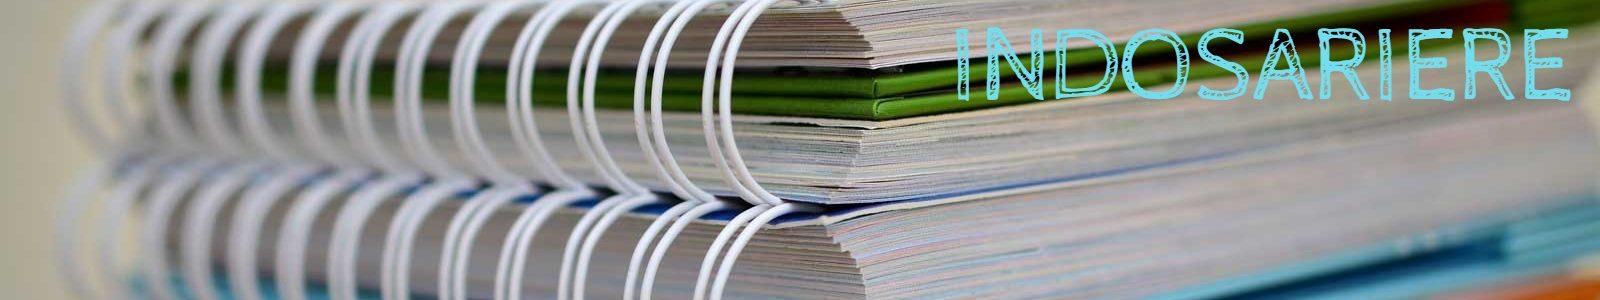 Serviceii de indosariere documente cu spira metalica sau de plastic diverse culori